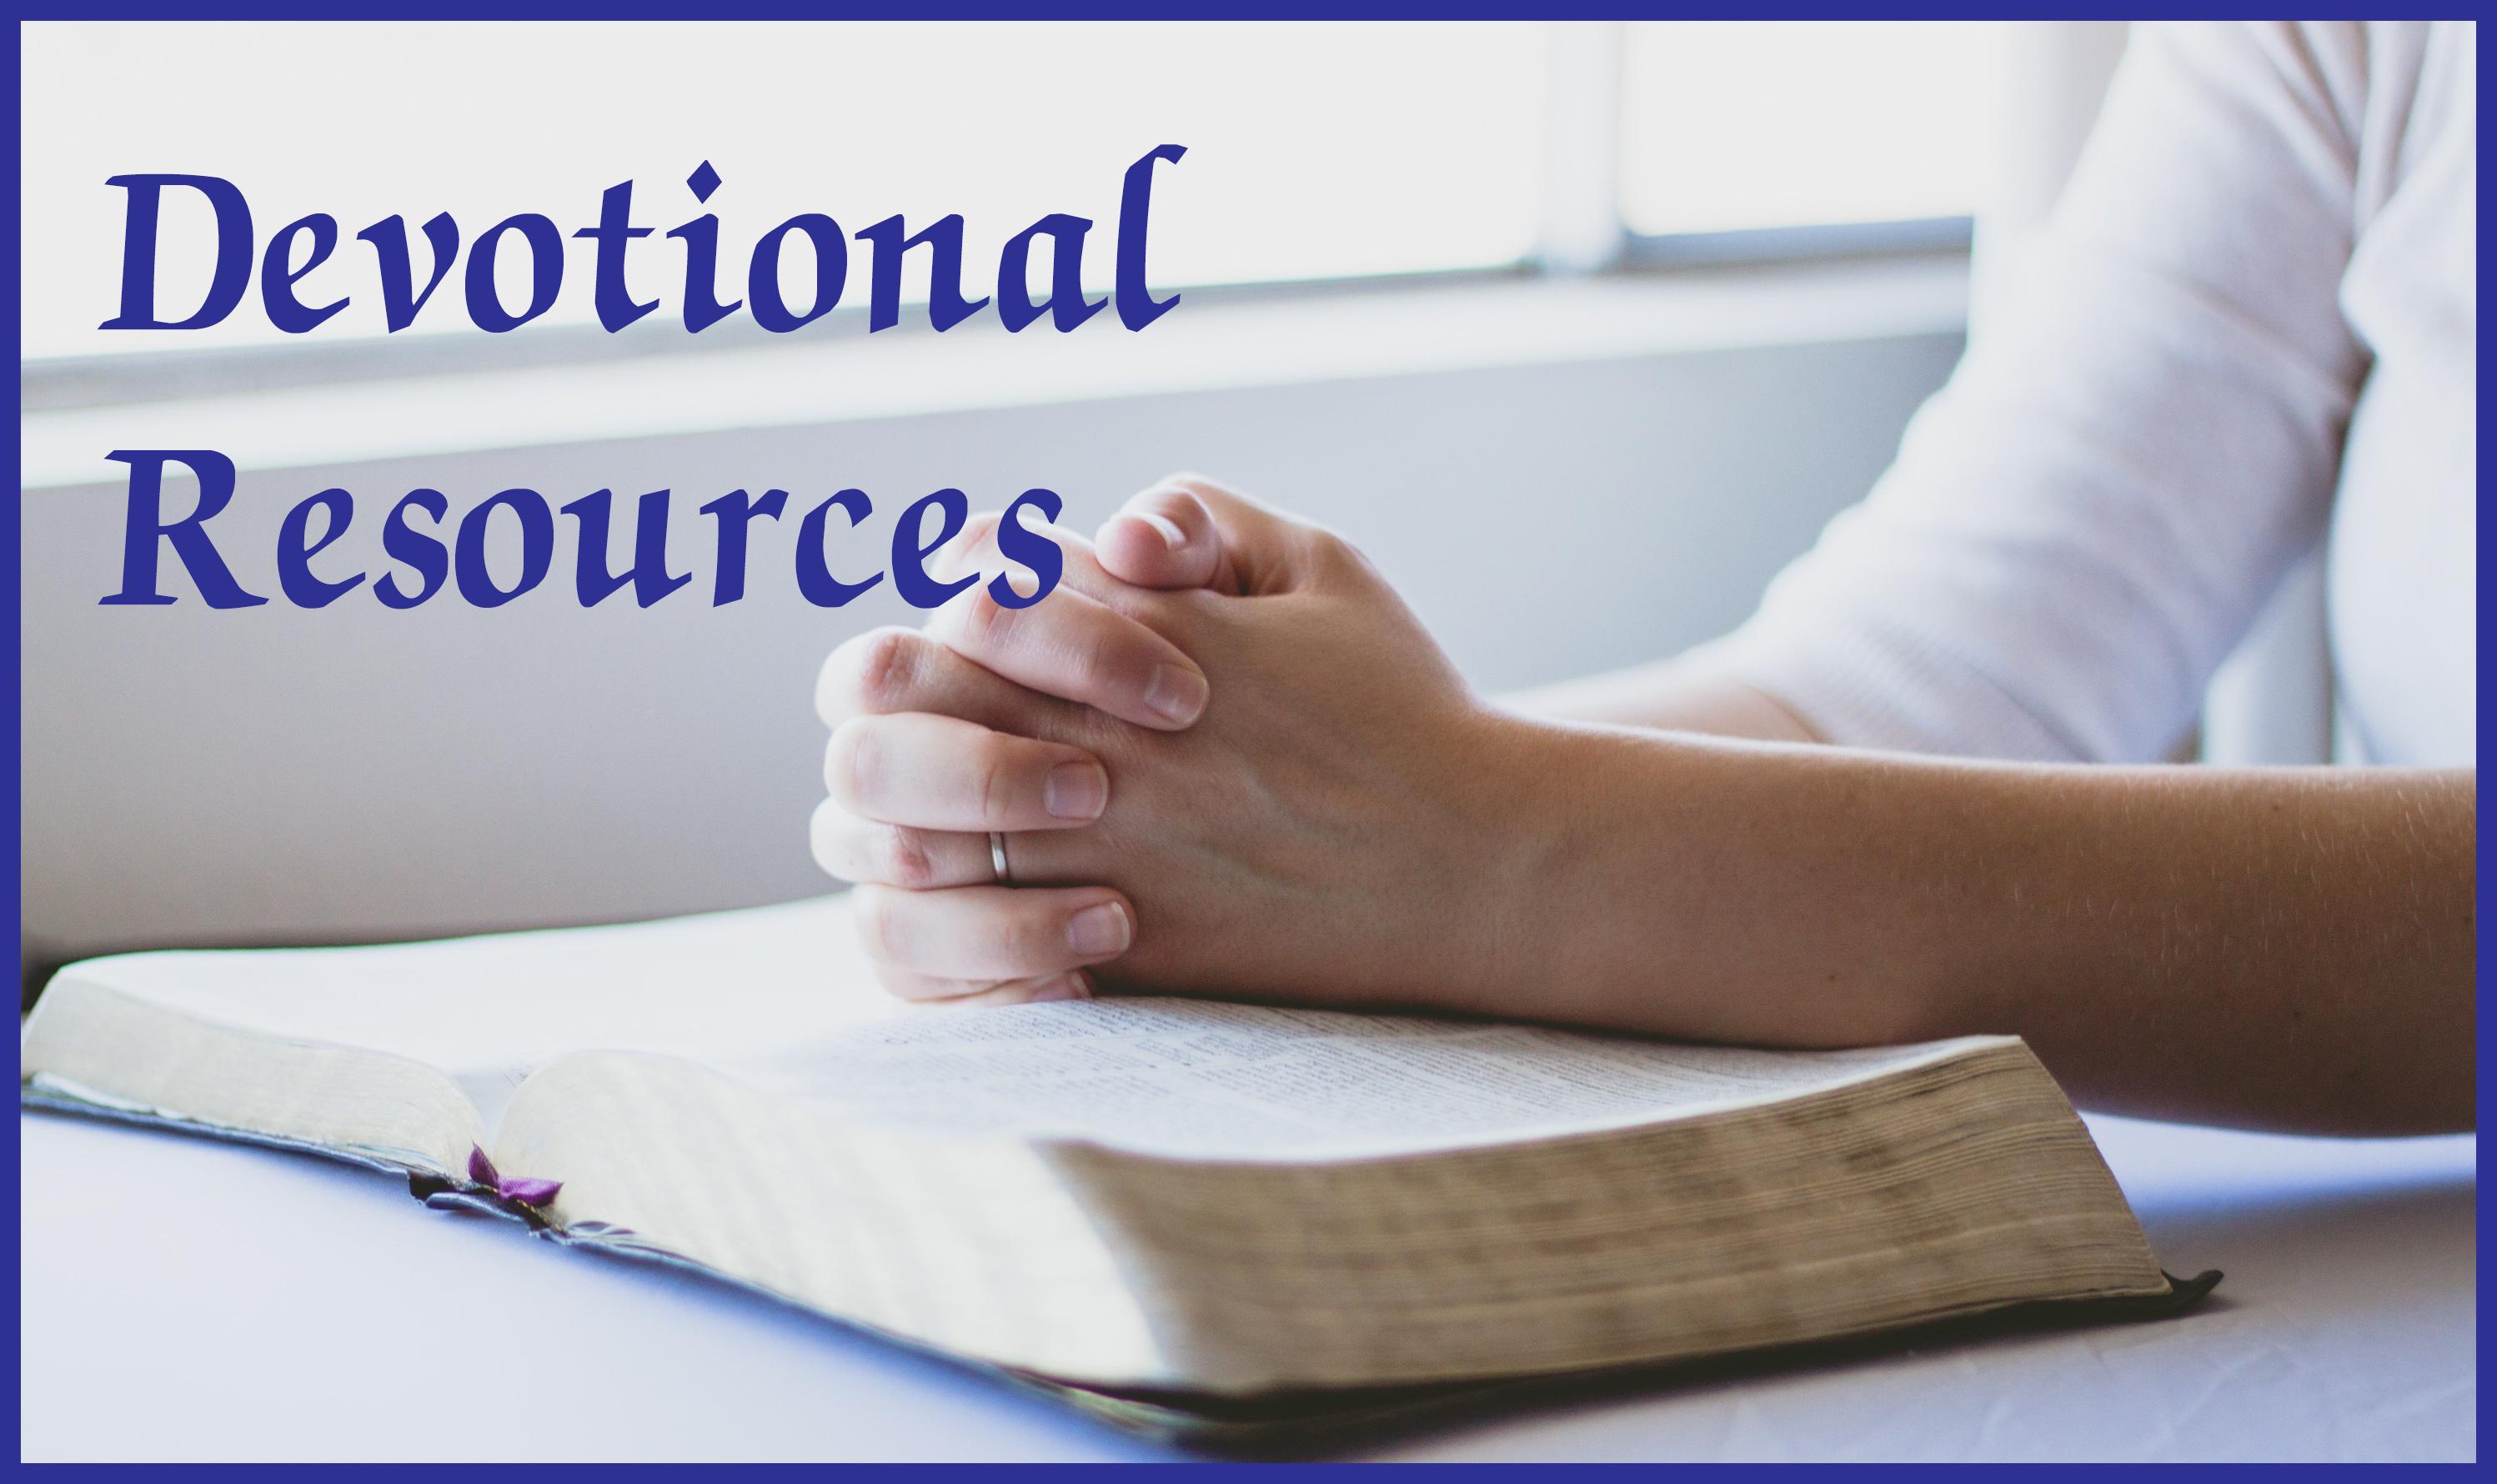 Devotional Resources